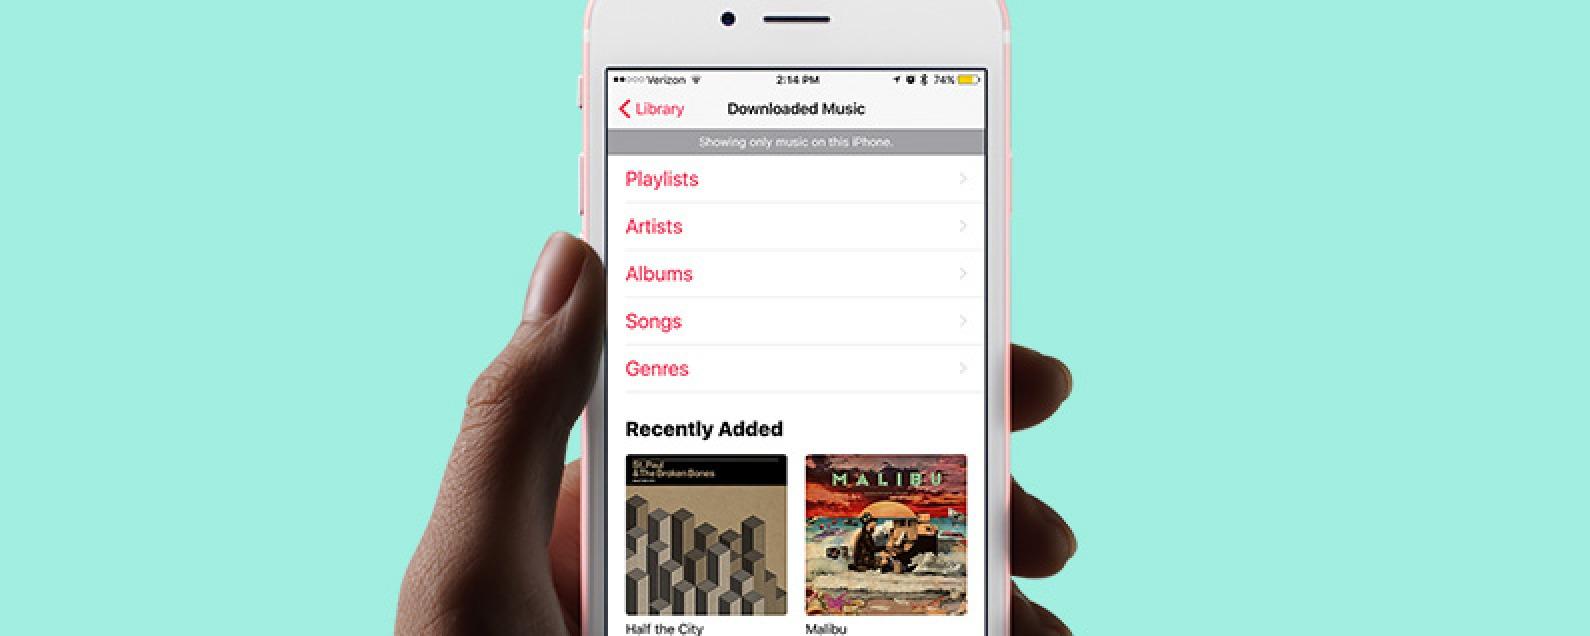 Apple Music | iPhoneLife com